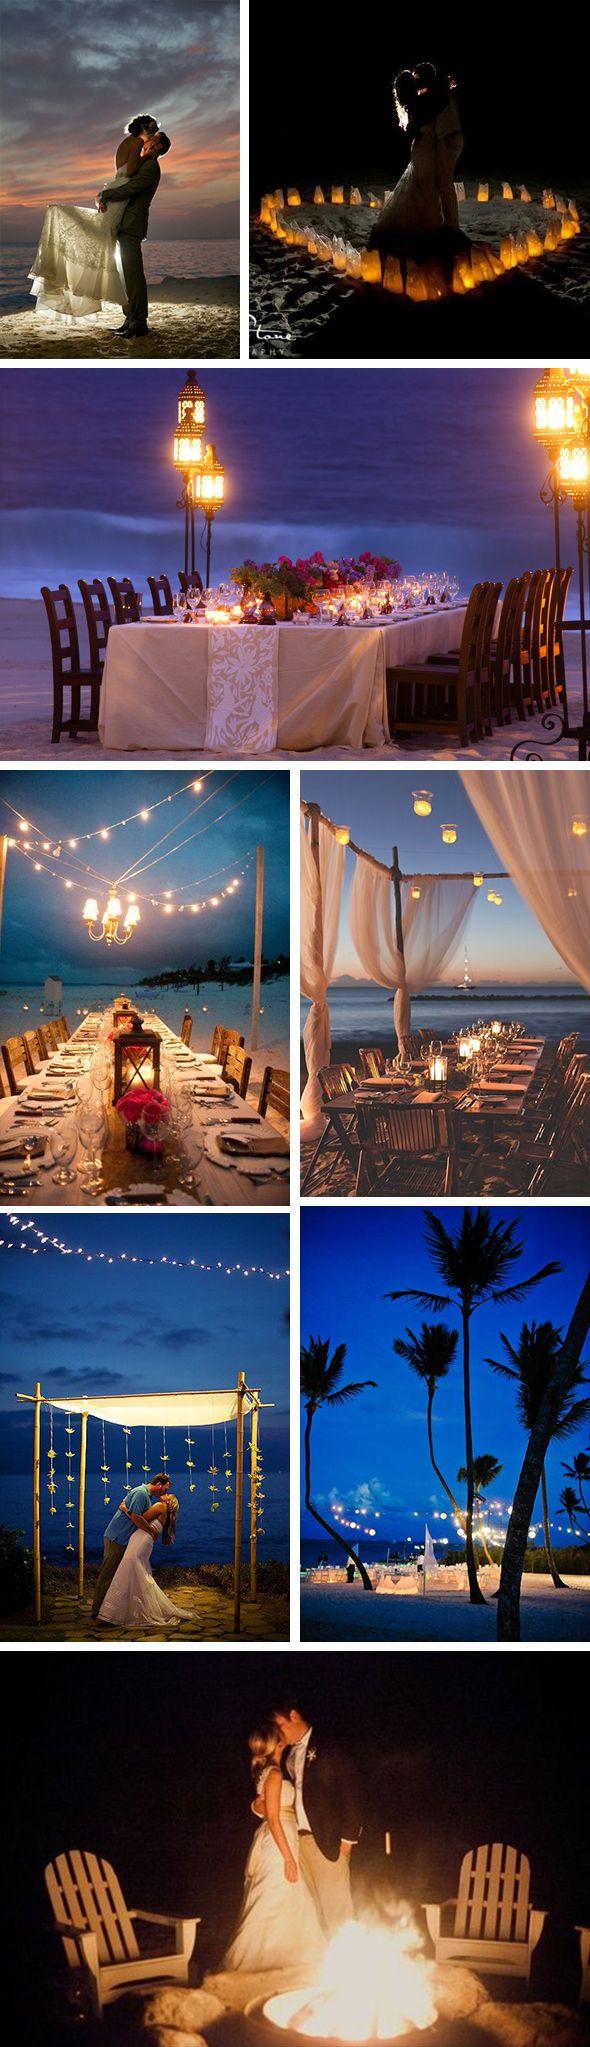 Night Beach Weddings Beach Weddings At Night Destination